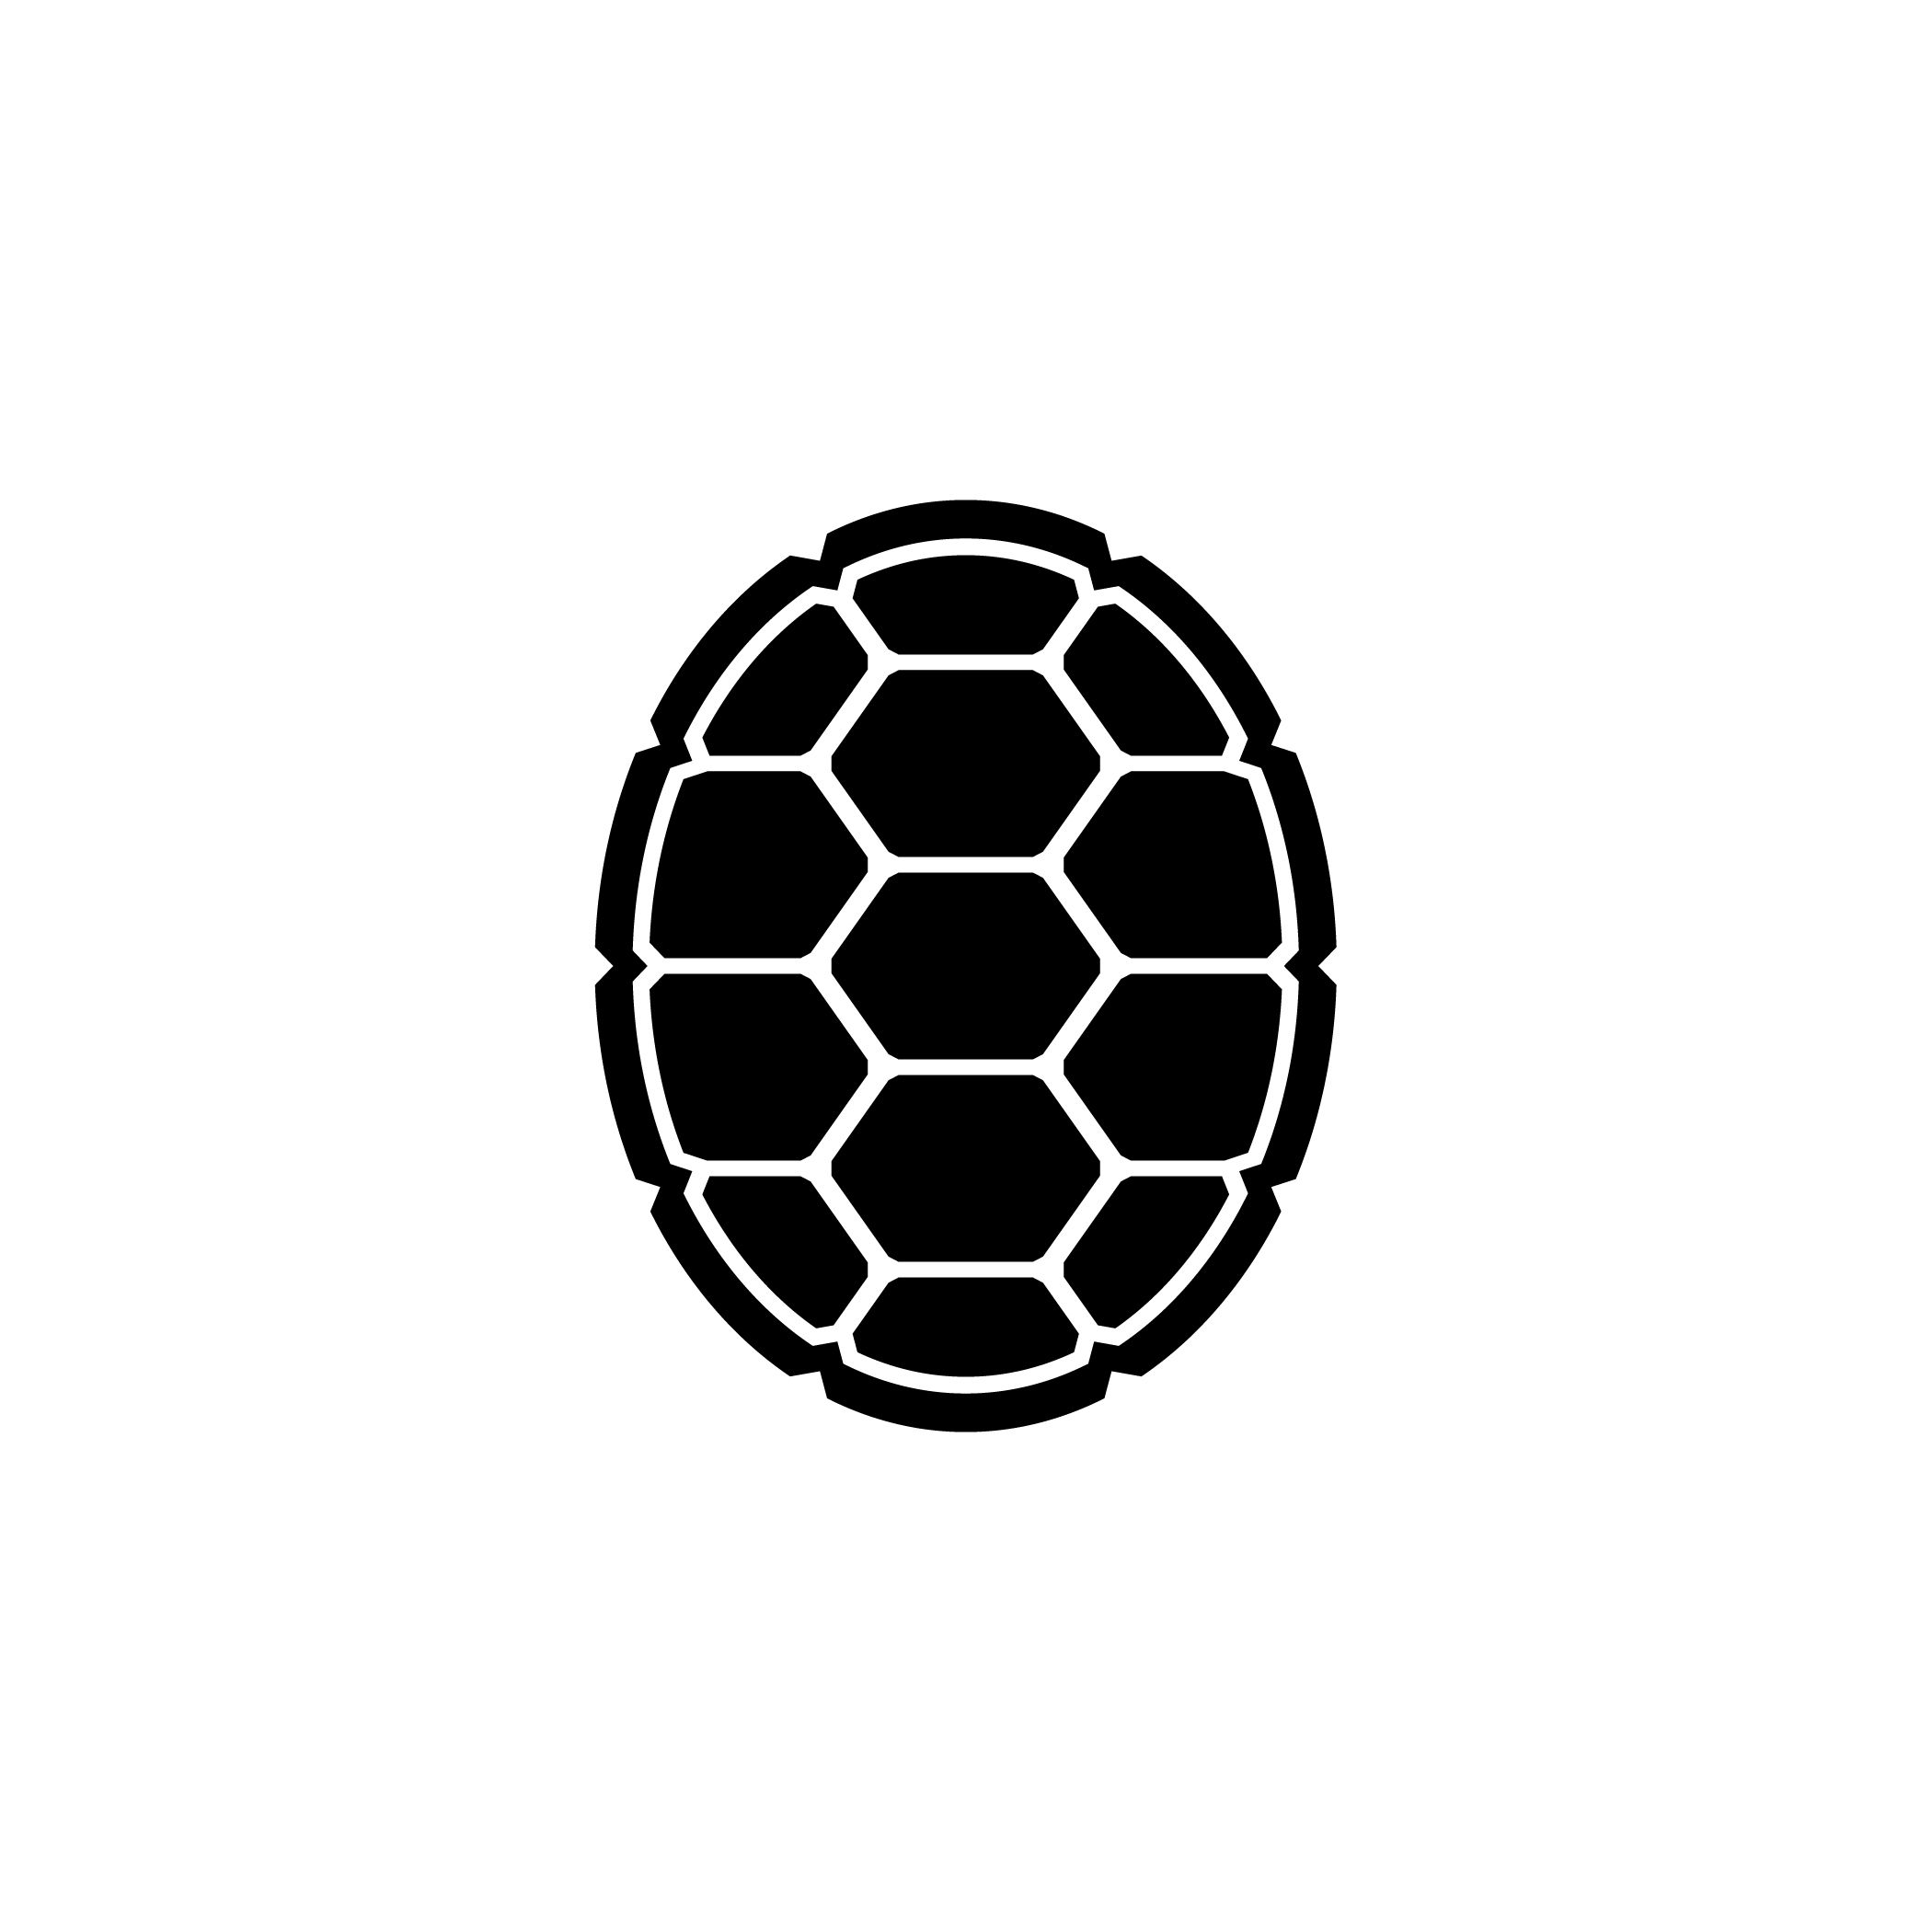 Ninja Turtle Shell Clip Art Clipart - Free Clipart on Pinterest ...